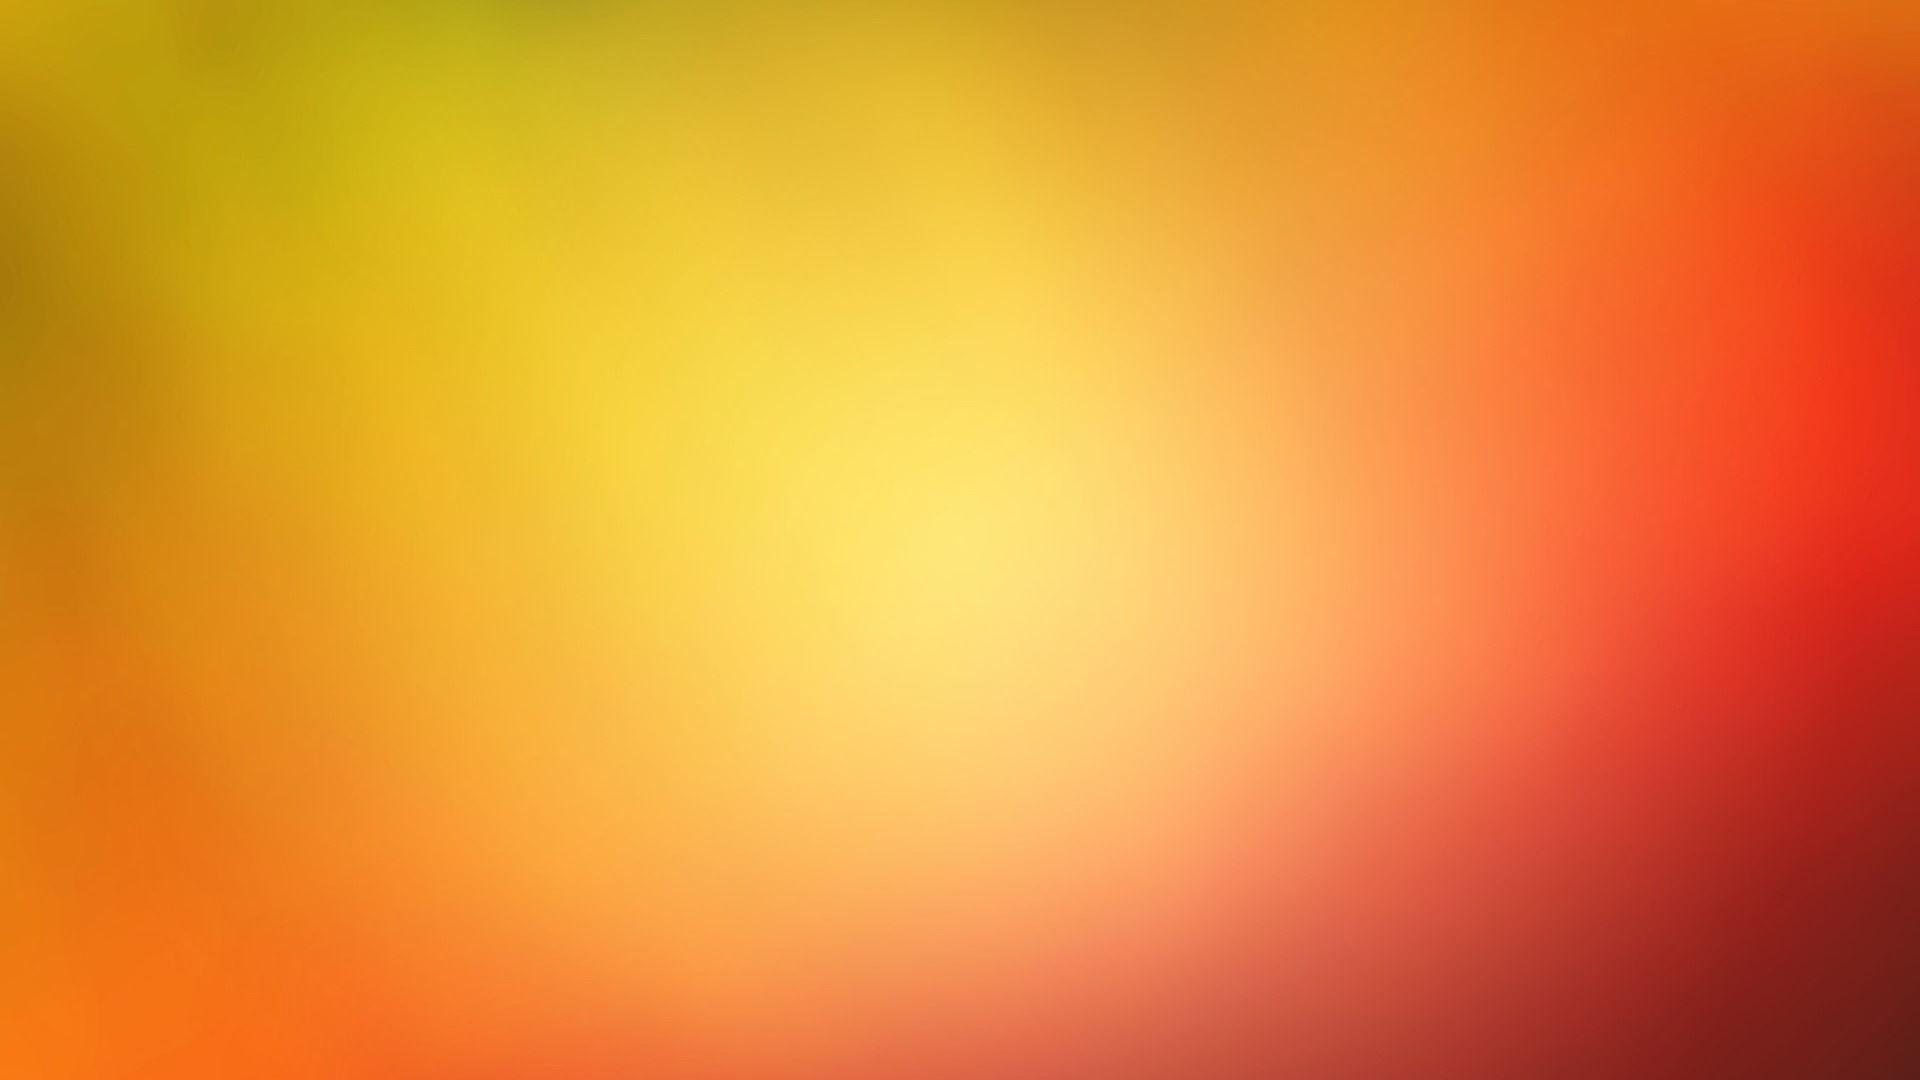 Bright Maroon Solid Color Wallpaper 2109 1920 x 1200 .